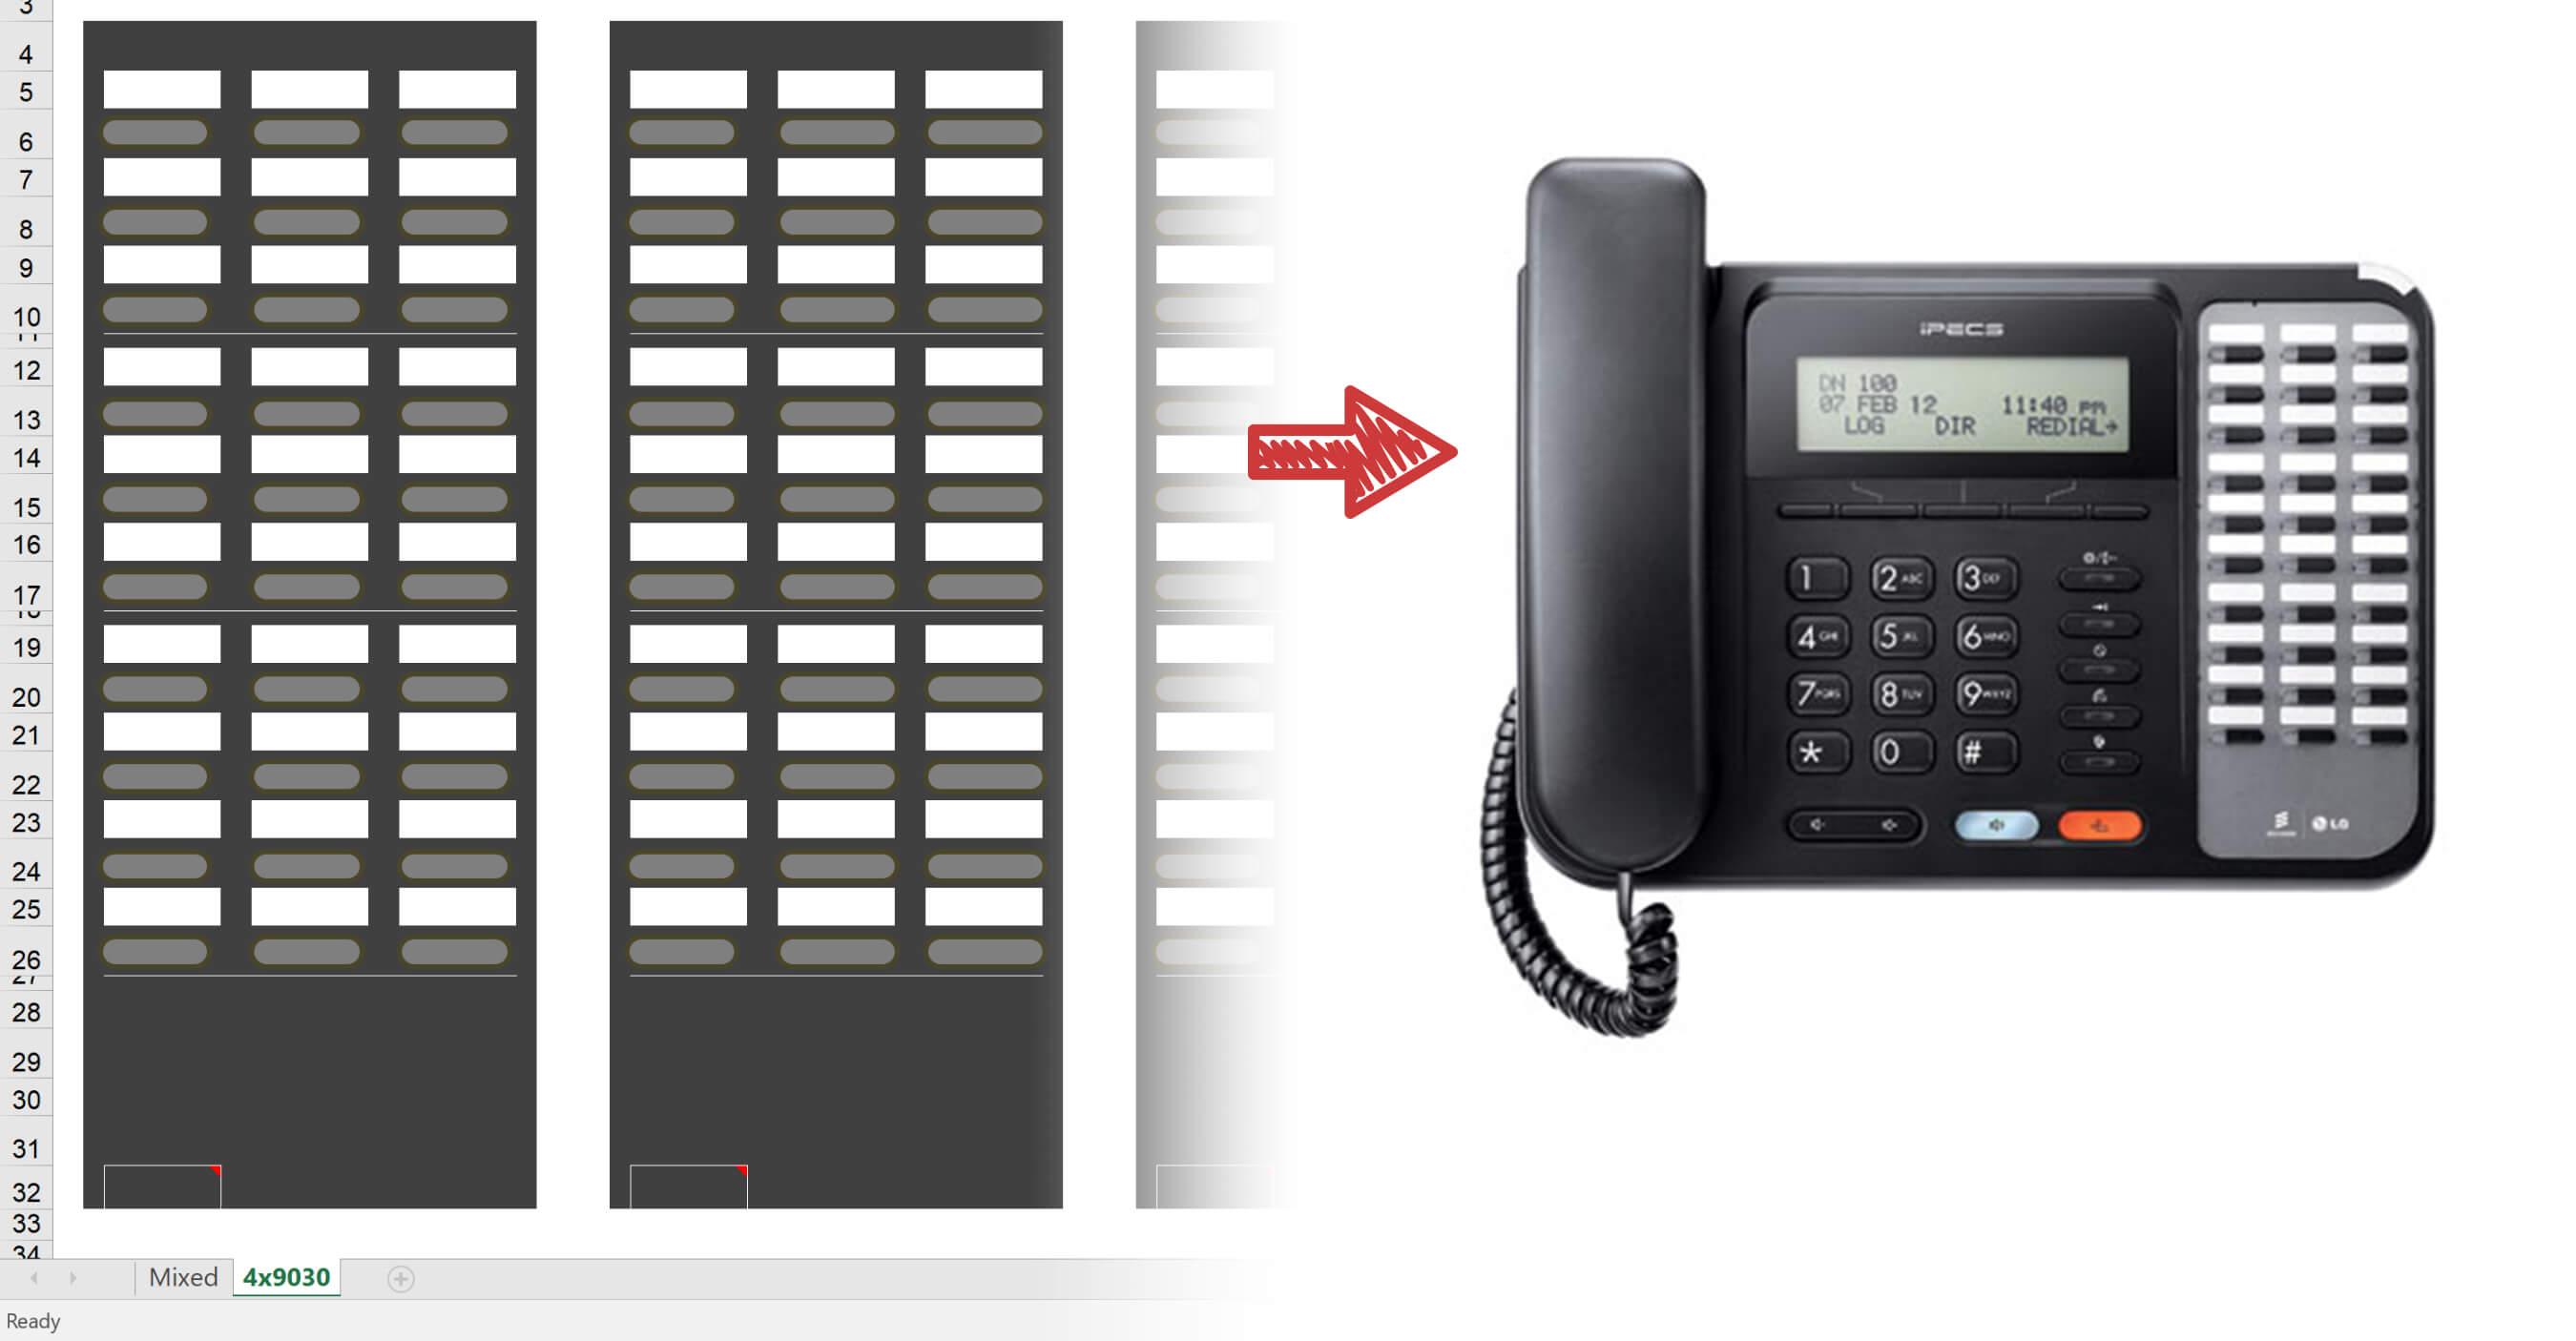 ipecs phone handset label printing guide infiniti. Black Bedroom Furniture Sets. Home Design Ideas